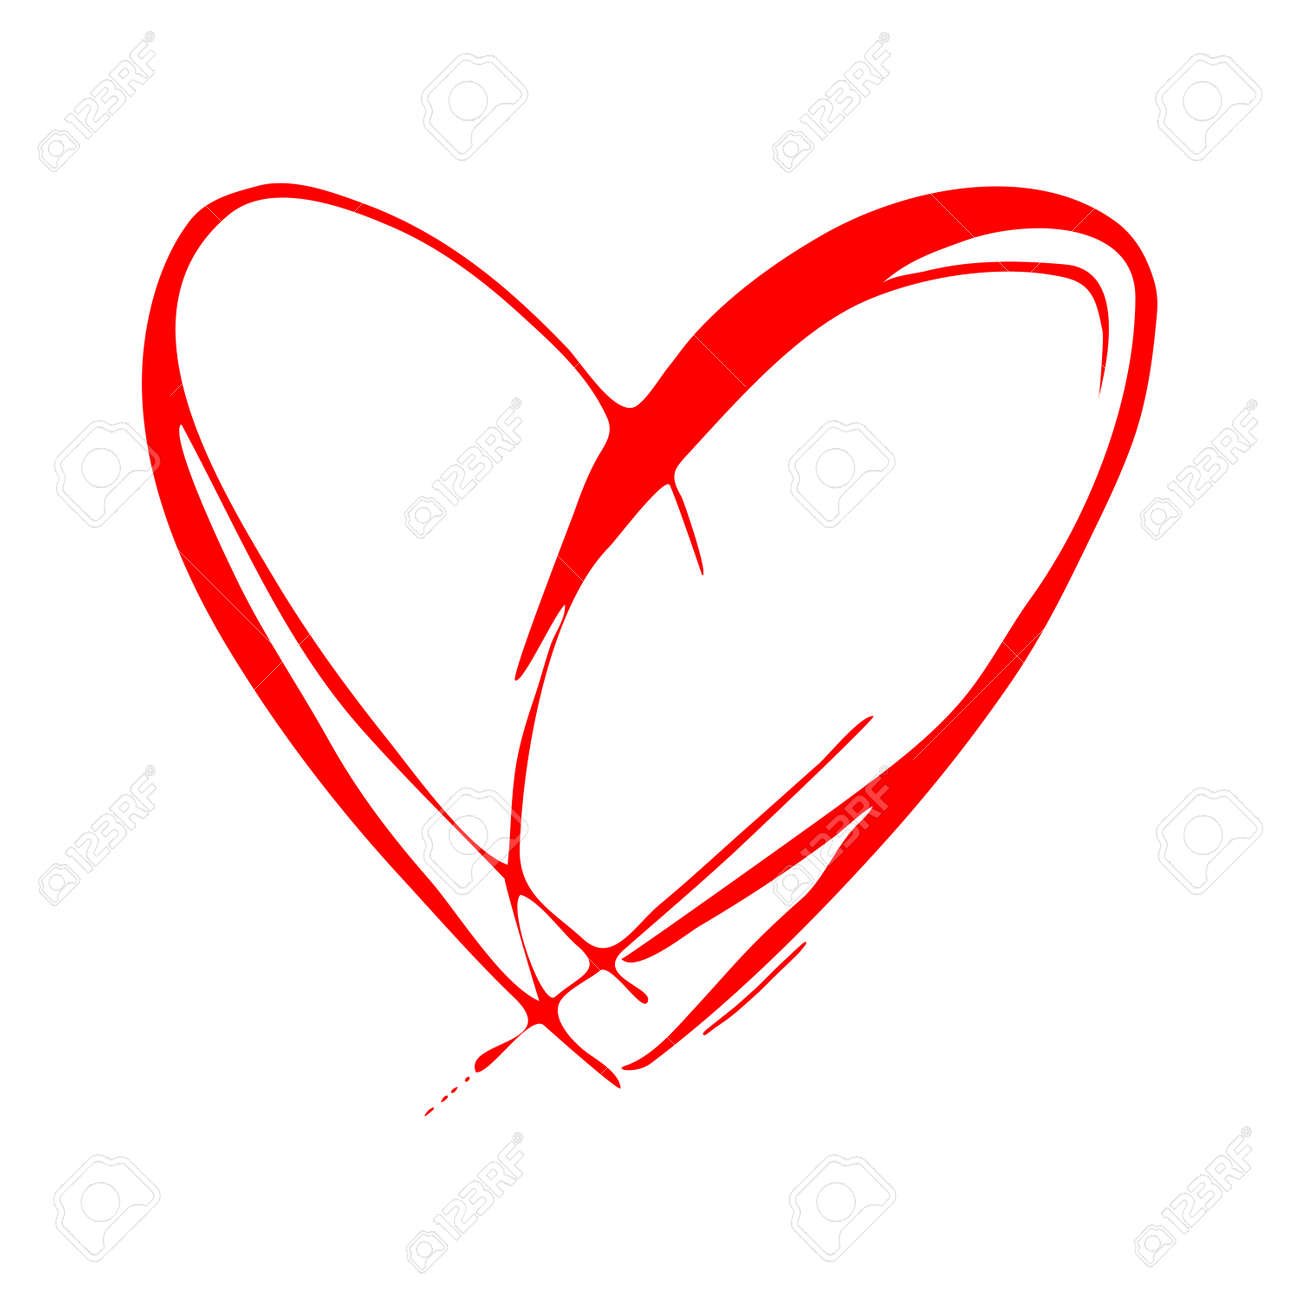 red heart vector icon love symbol valentines day sign emblem rh 123rf com heart vector black heart vectors for corel draw